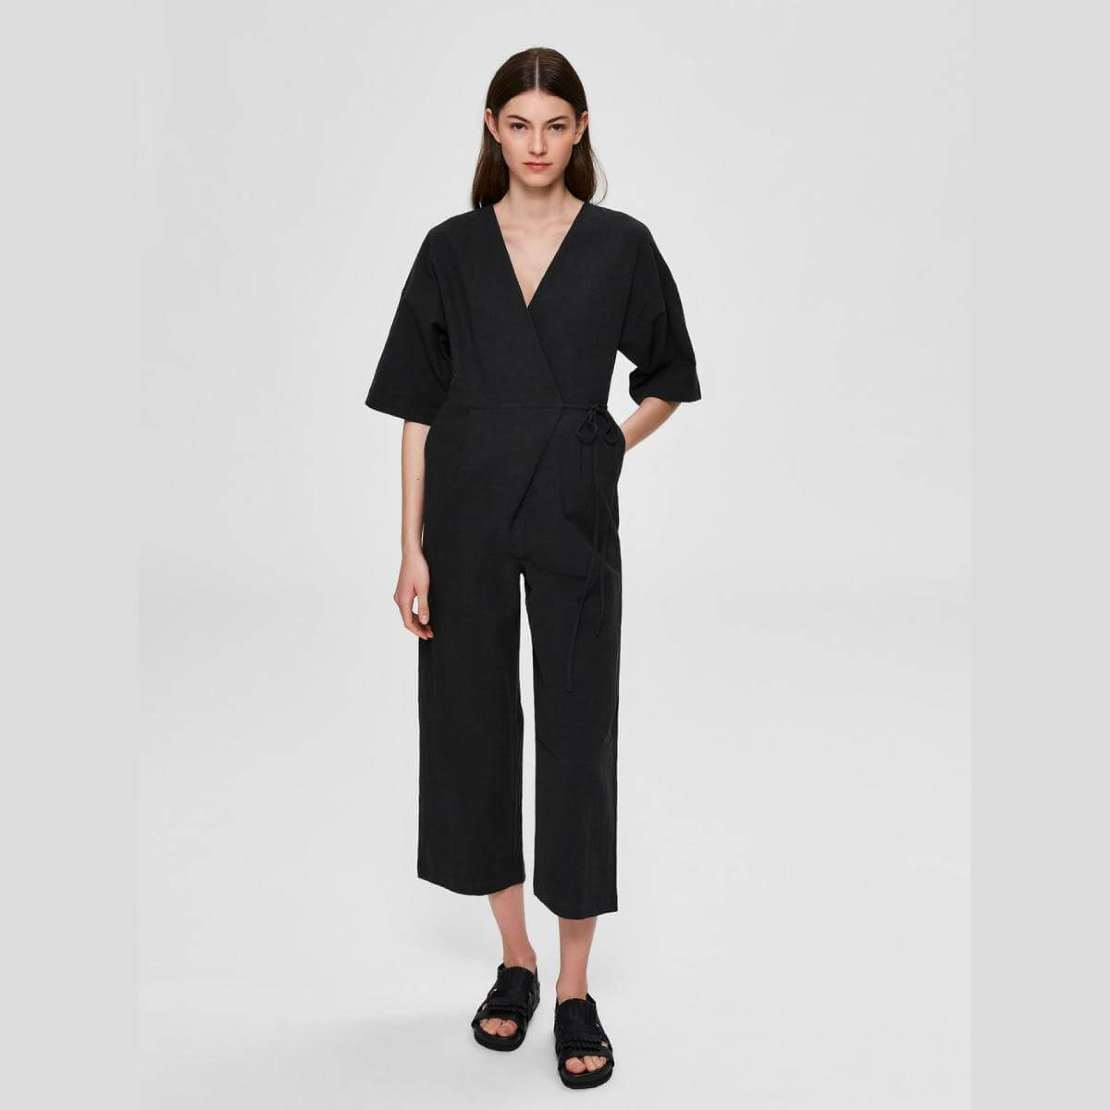 Selected Femme Black Jumpsuit